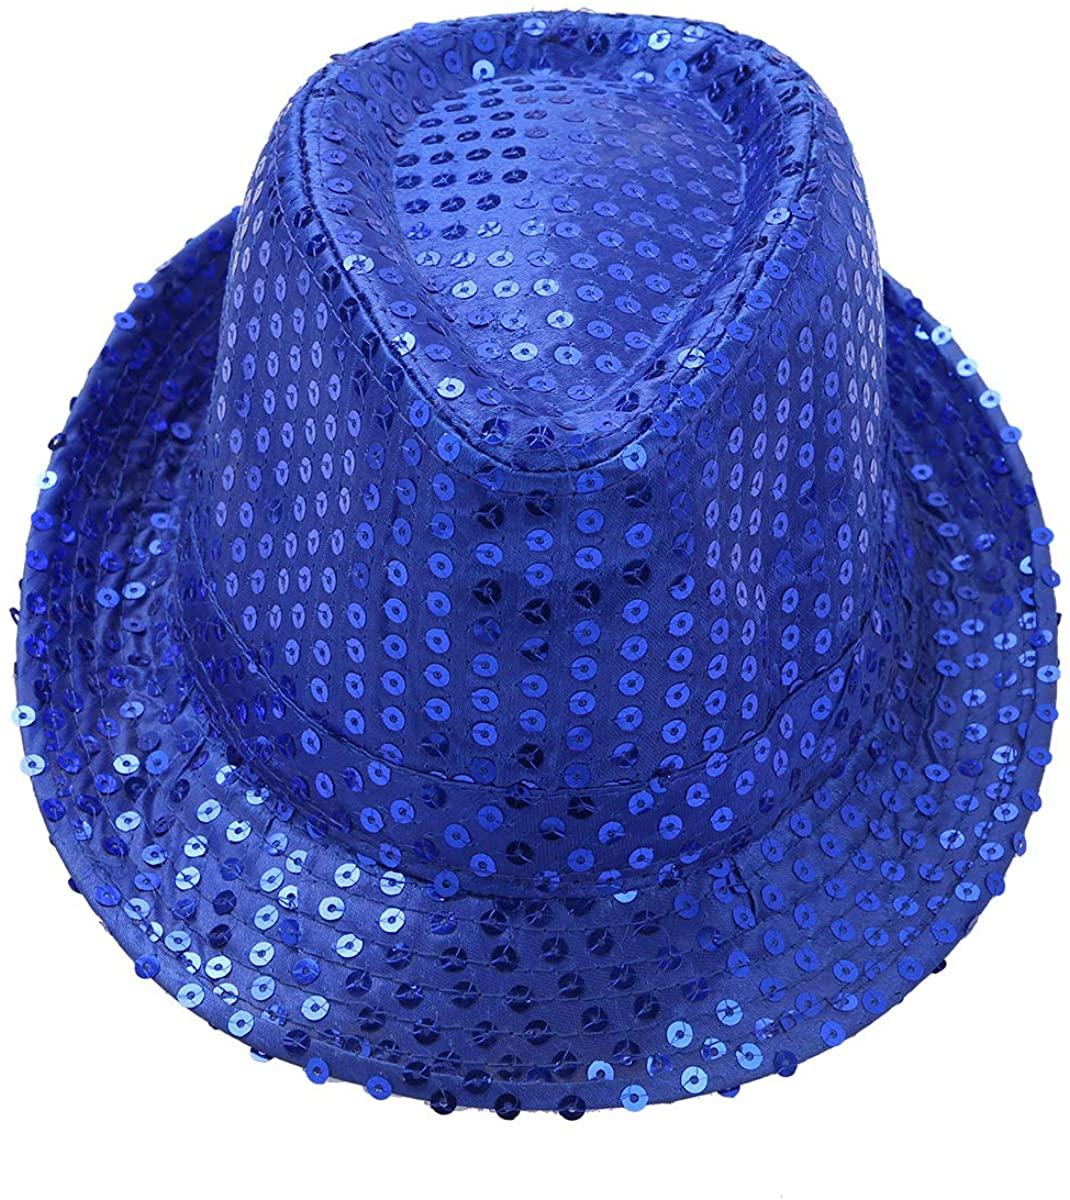 vastwit Unisex Boys Girls Shiny Sequins Fedora Party Hat Hip-Hop Jazz Dance Stage Performance Costumes